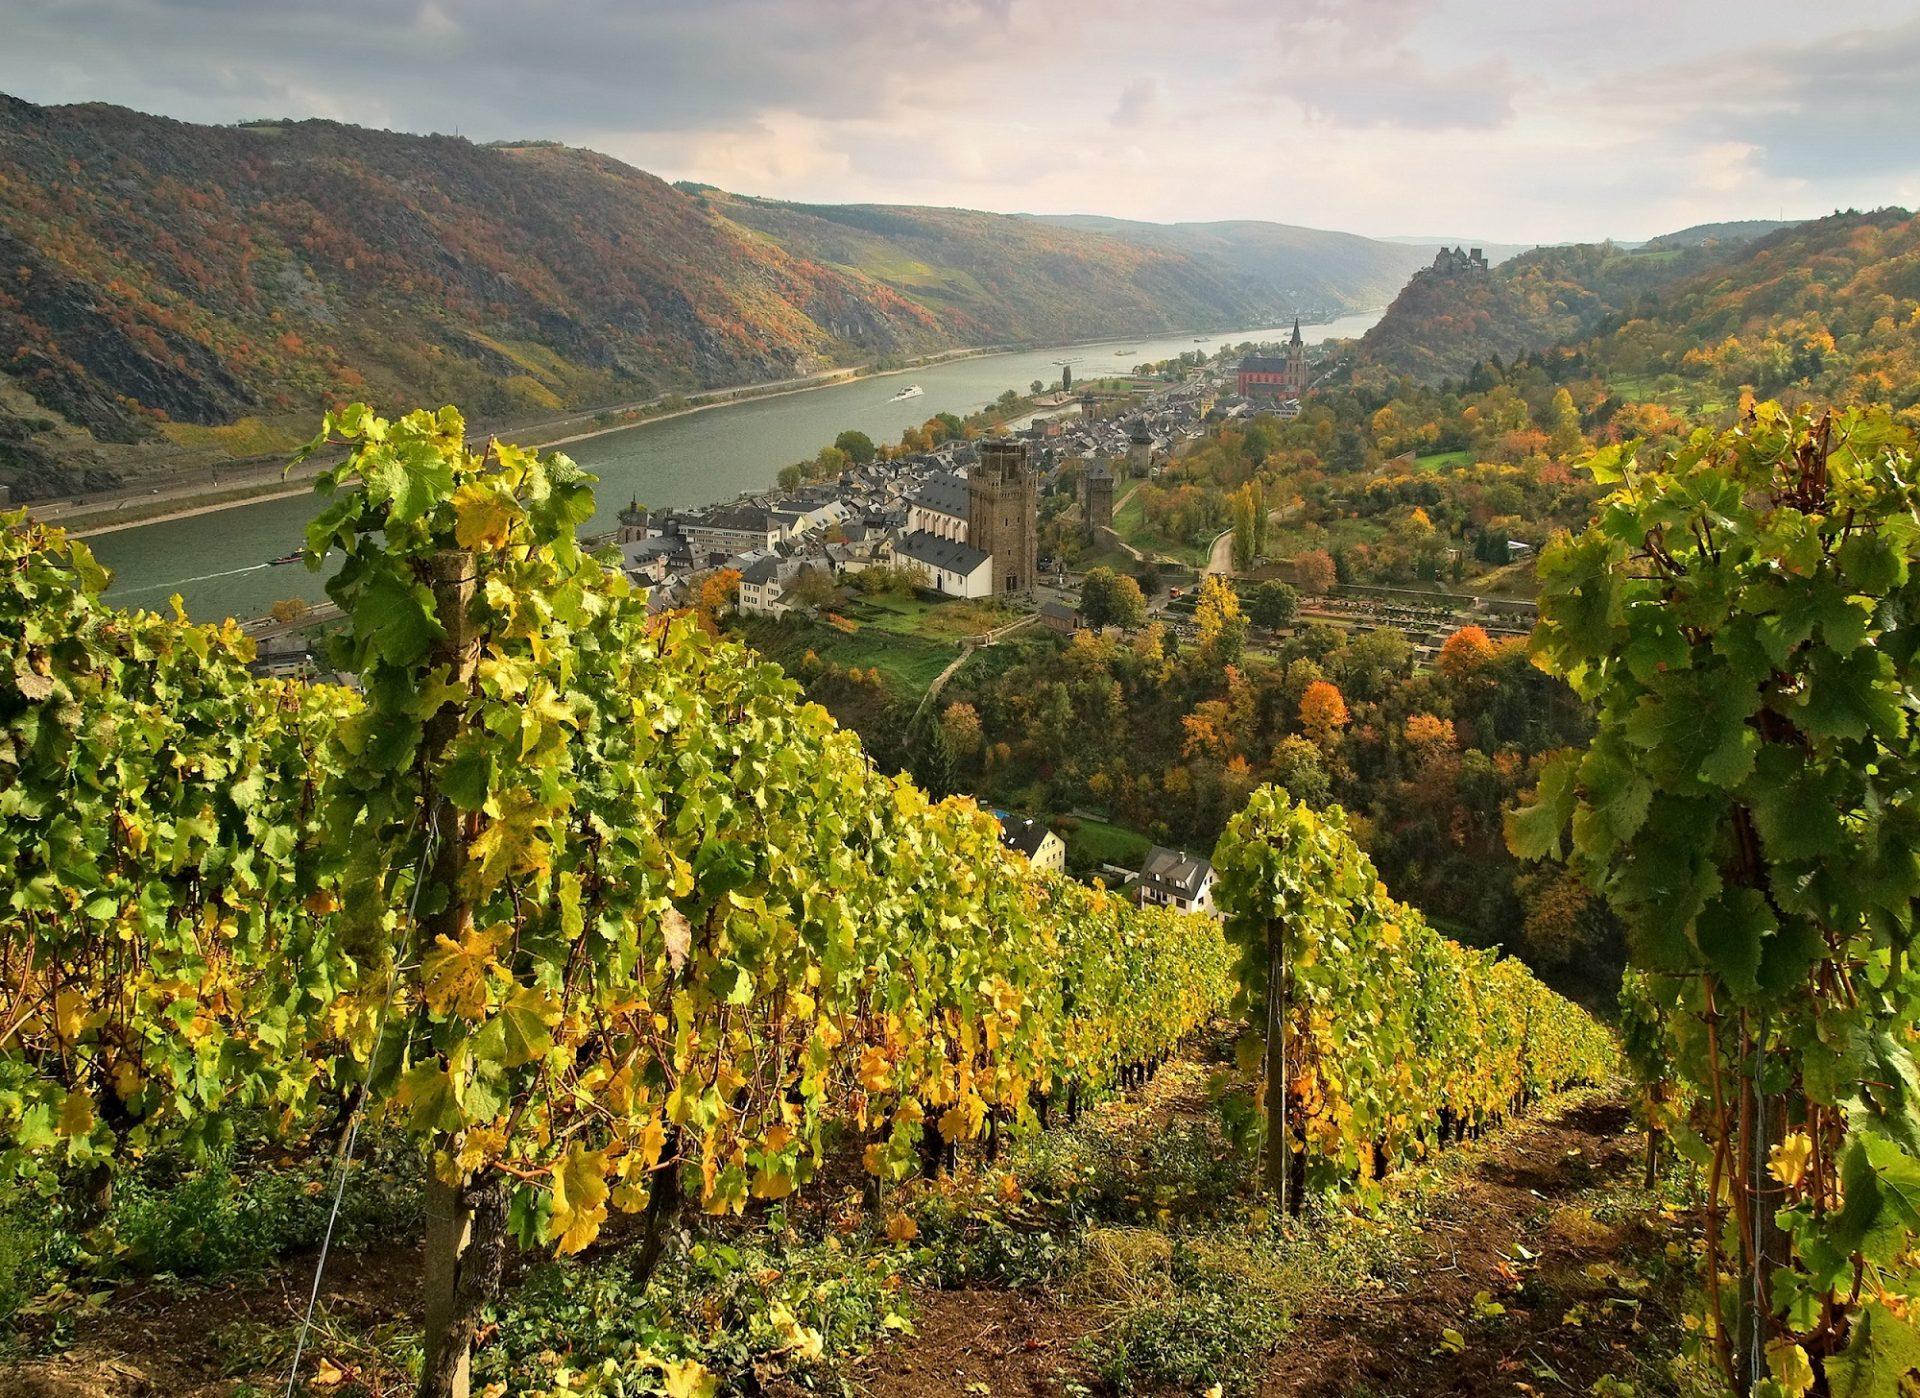 vinhos brancos alemaes safras premiadas inundacoes 1